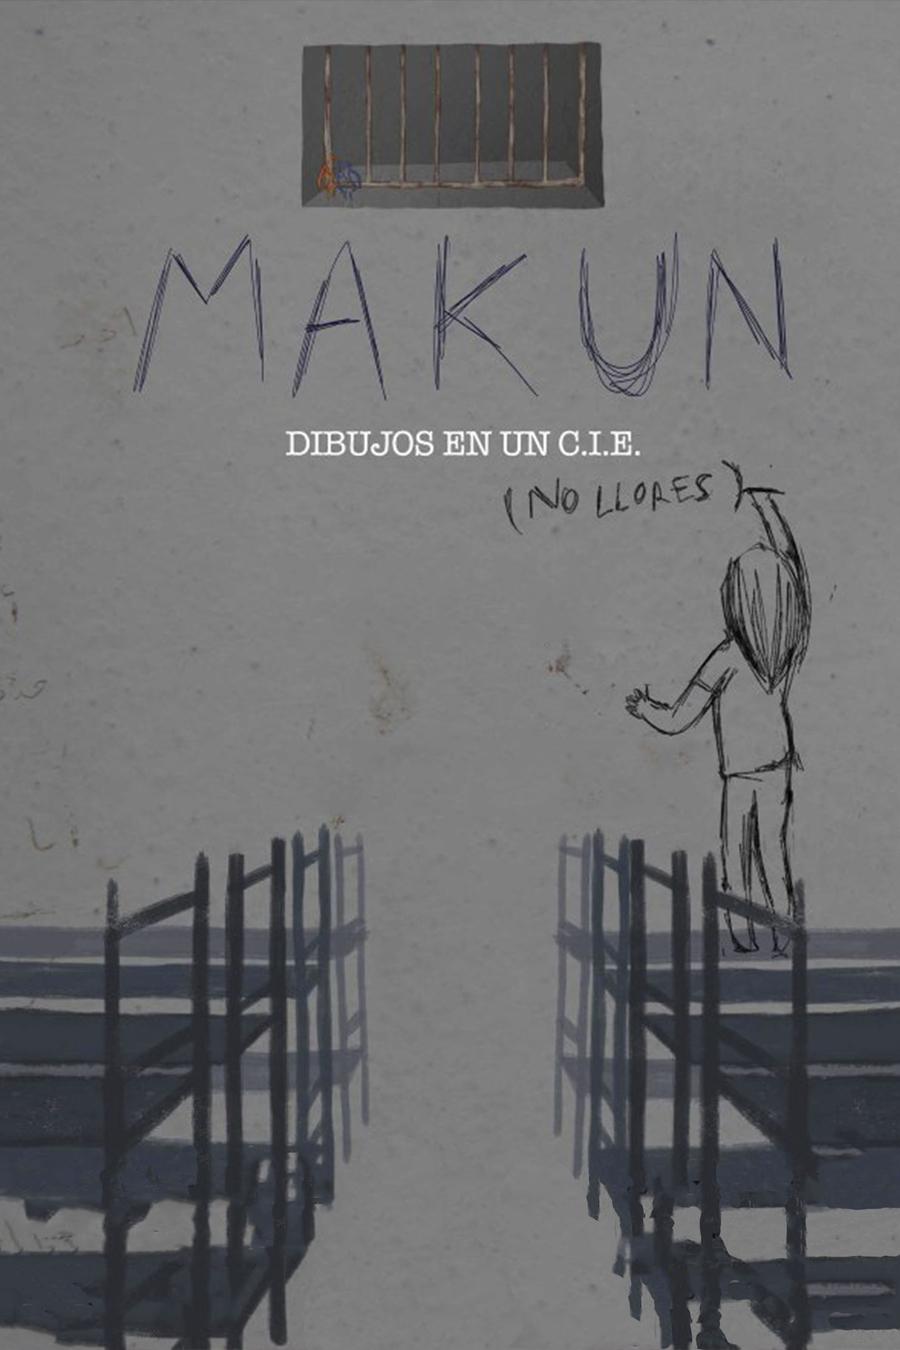 Makun: dibujos en un C.I.E